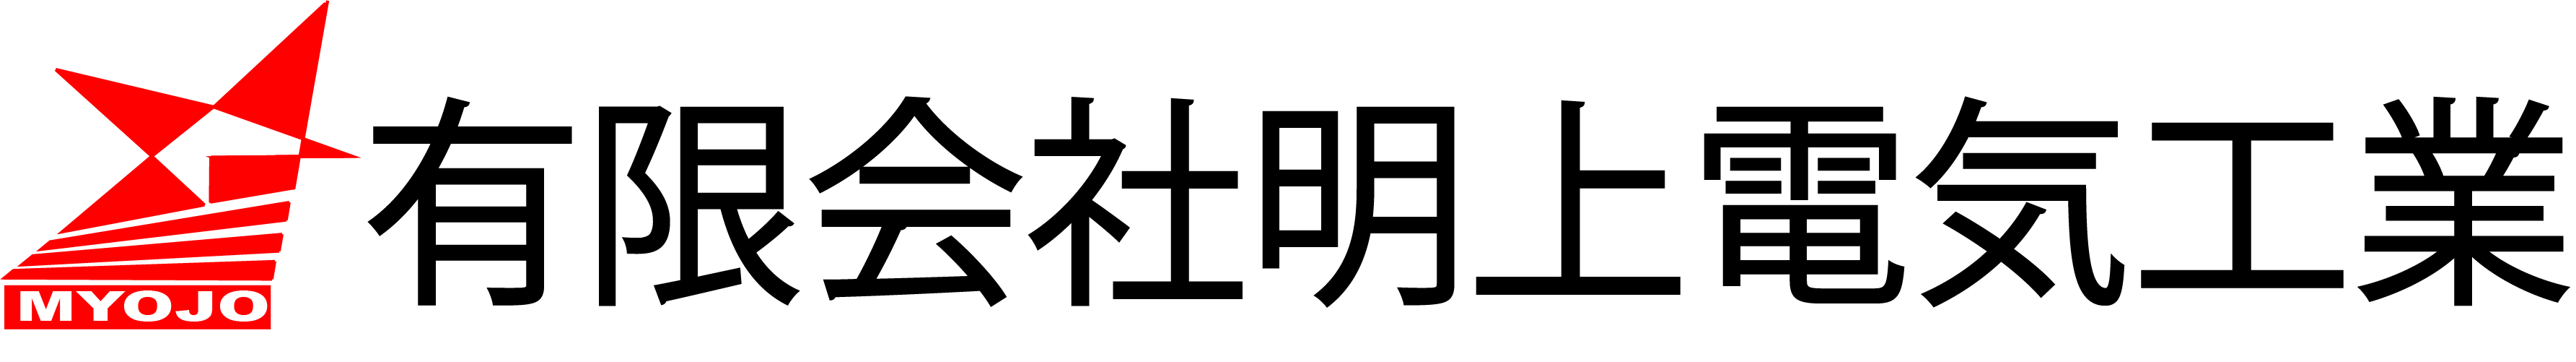 myojo logo with title 4